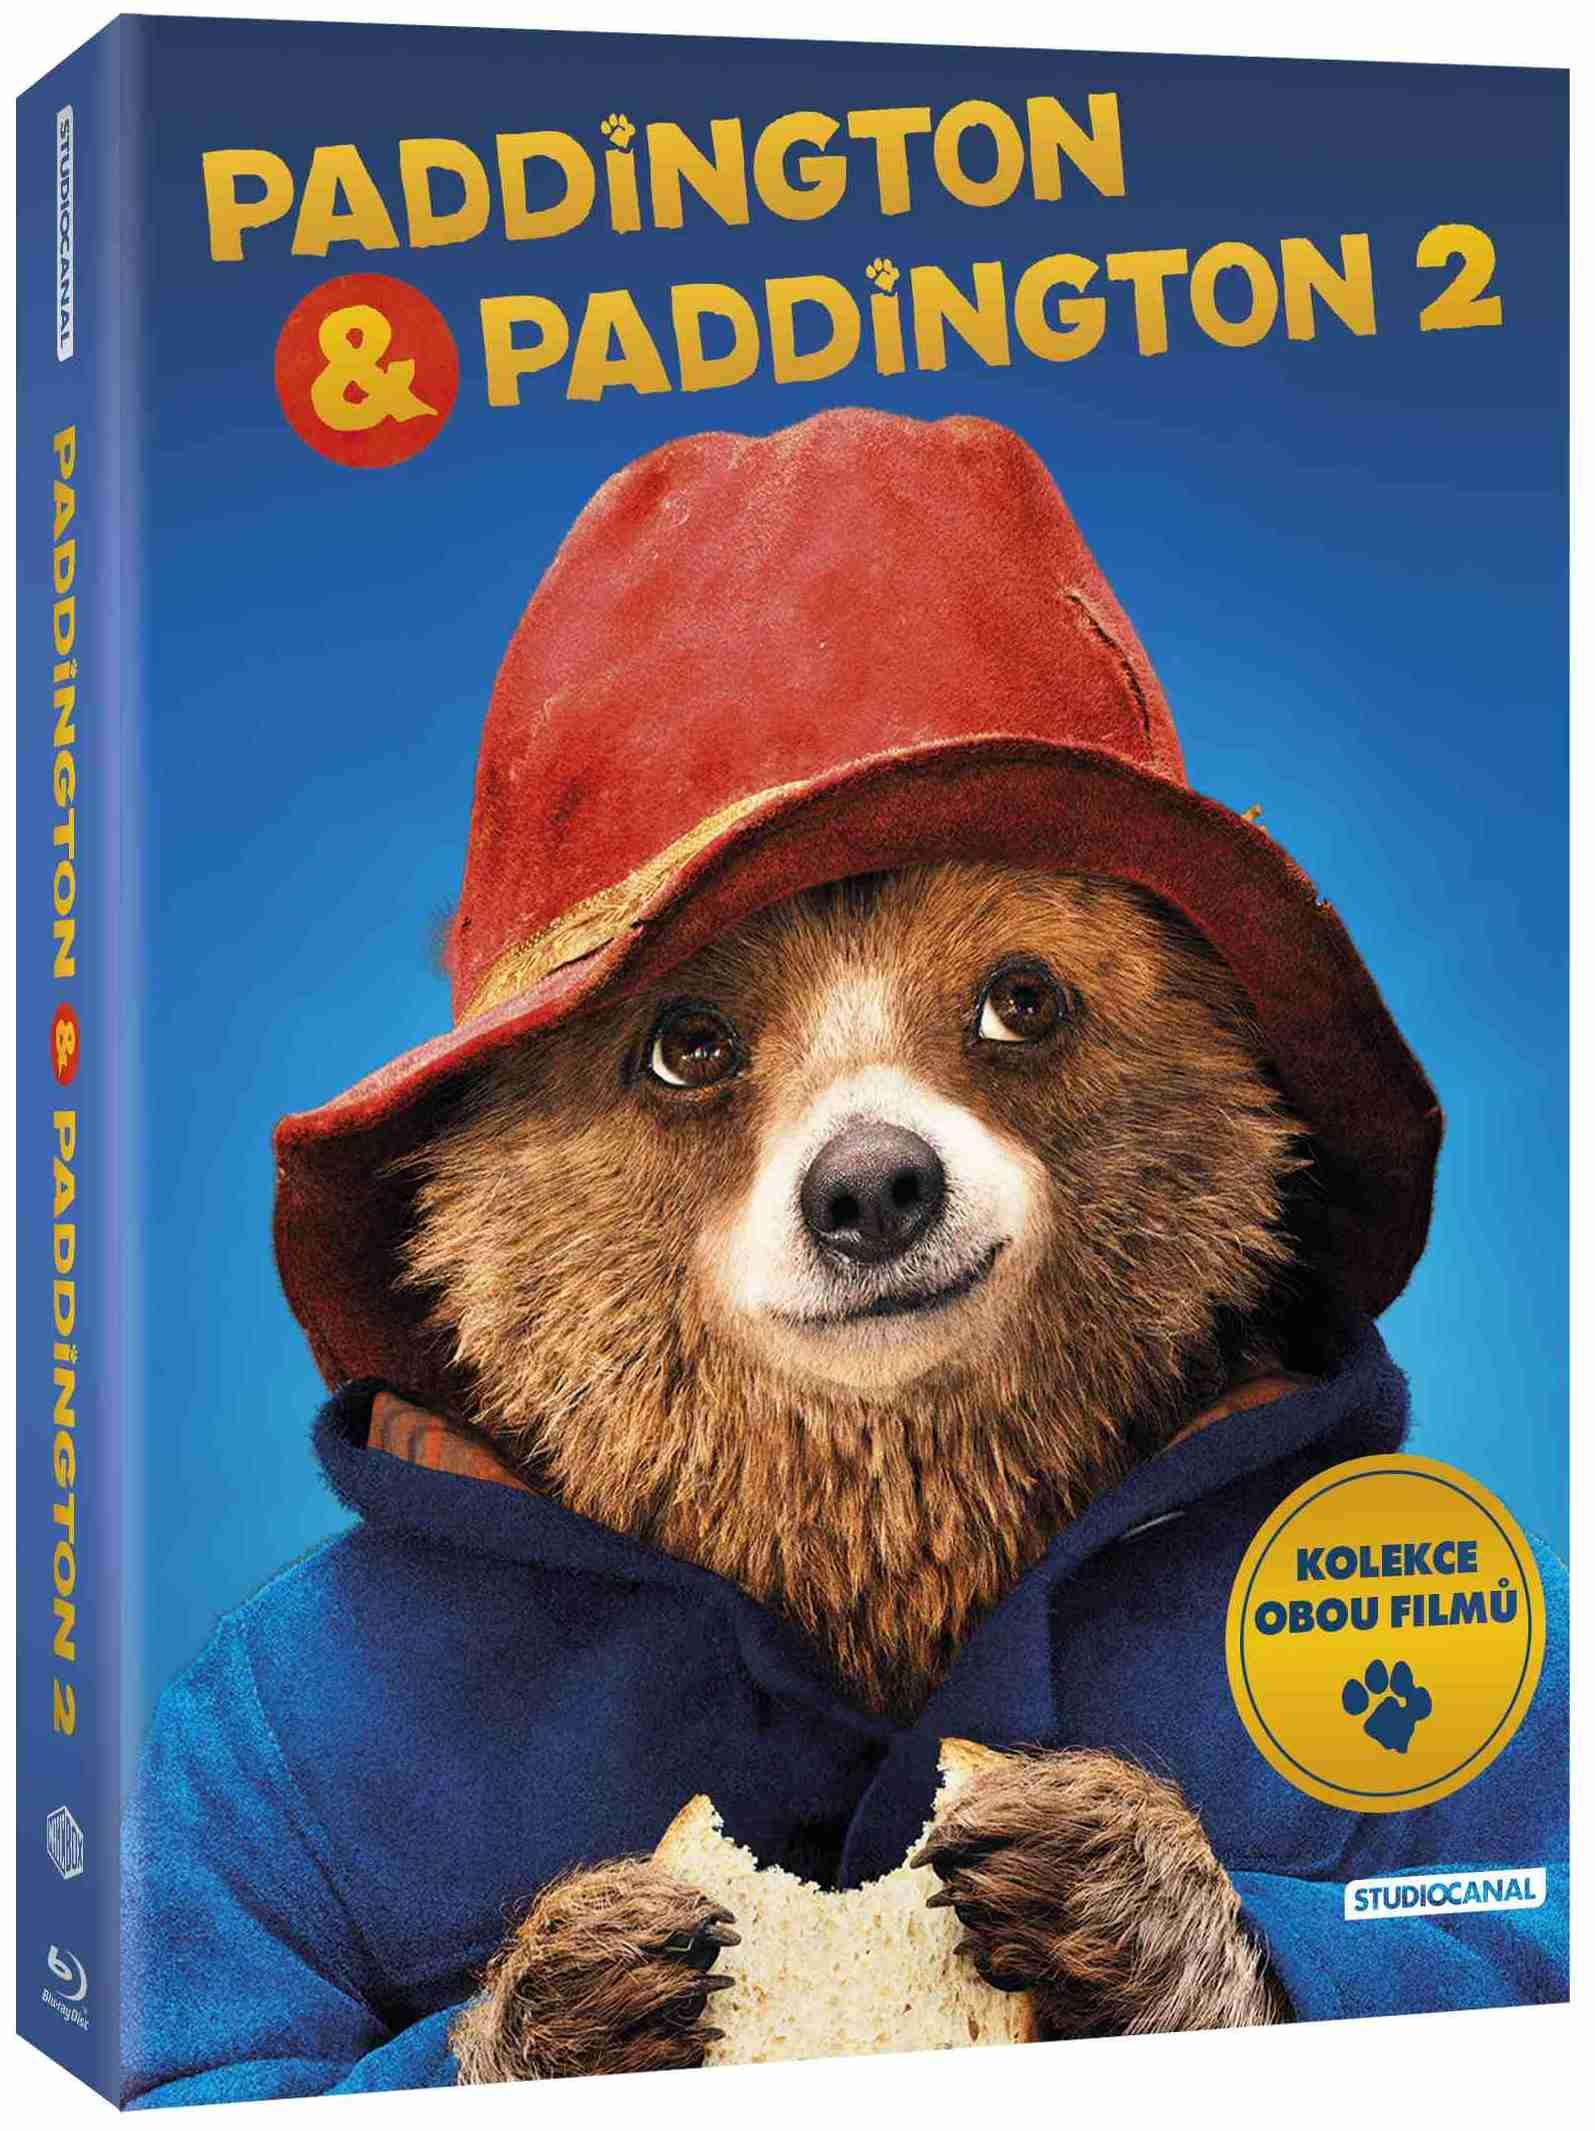 Paddington 1+2 kolekce - Blu-ray (2 BD)